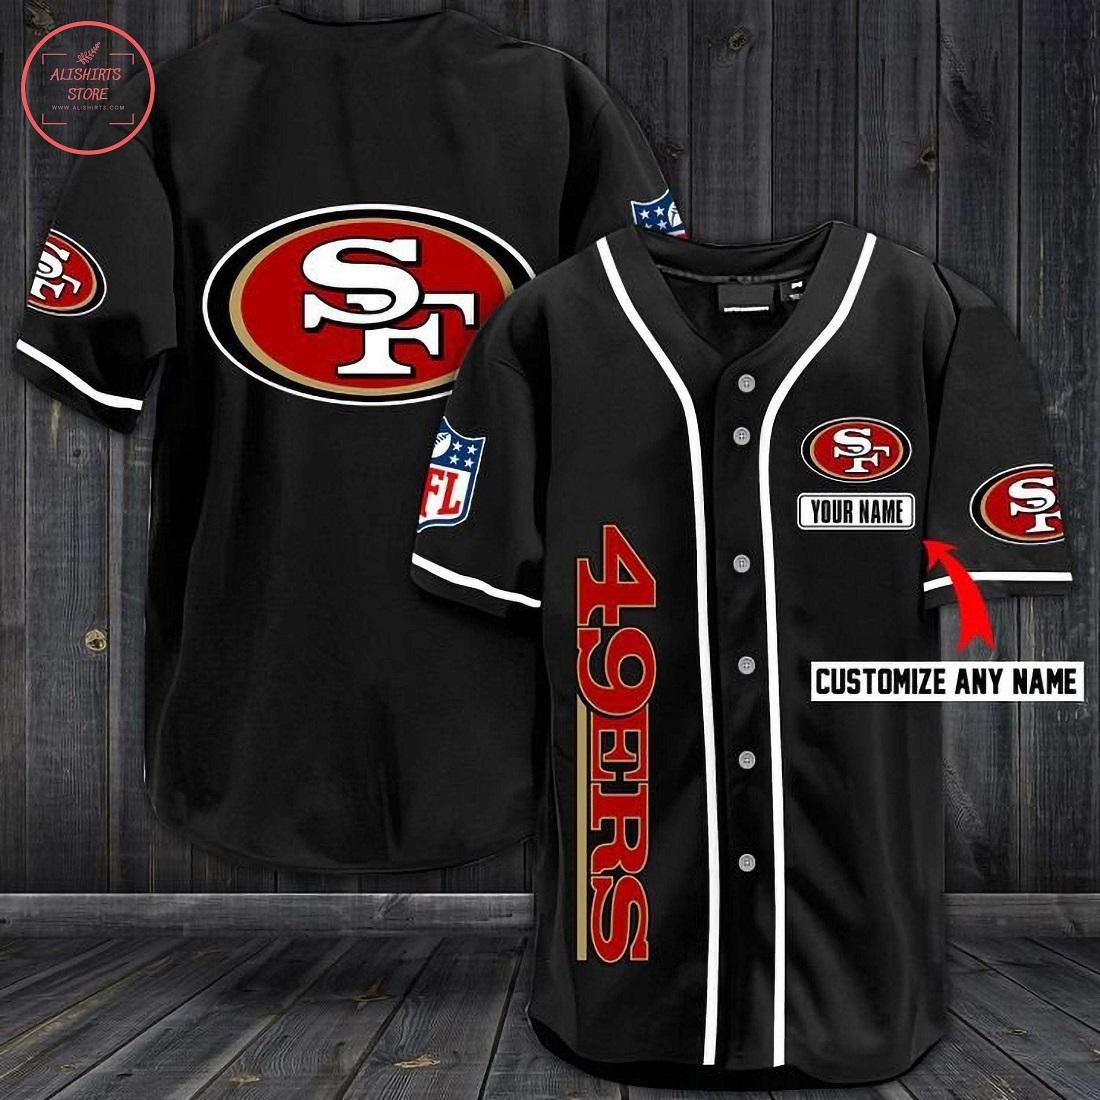 San Francisco 49ers Personalized Custom Baseball Jersey